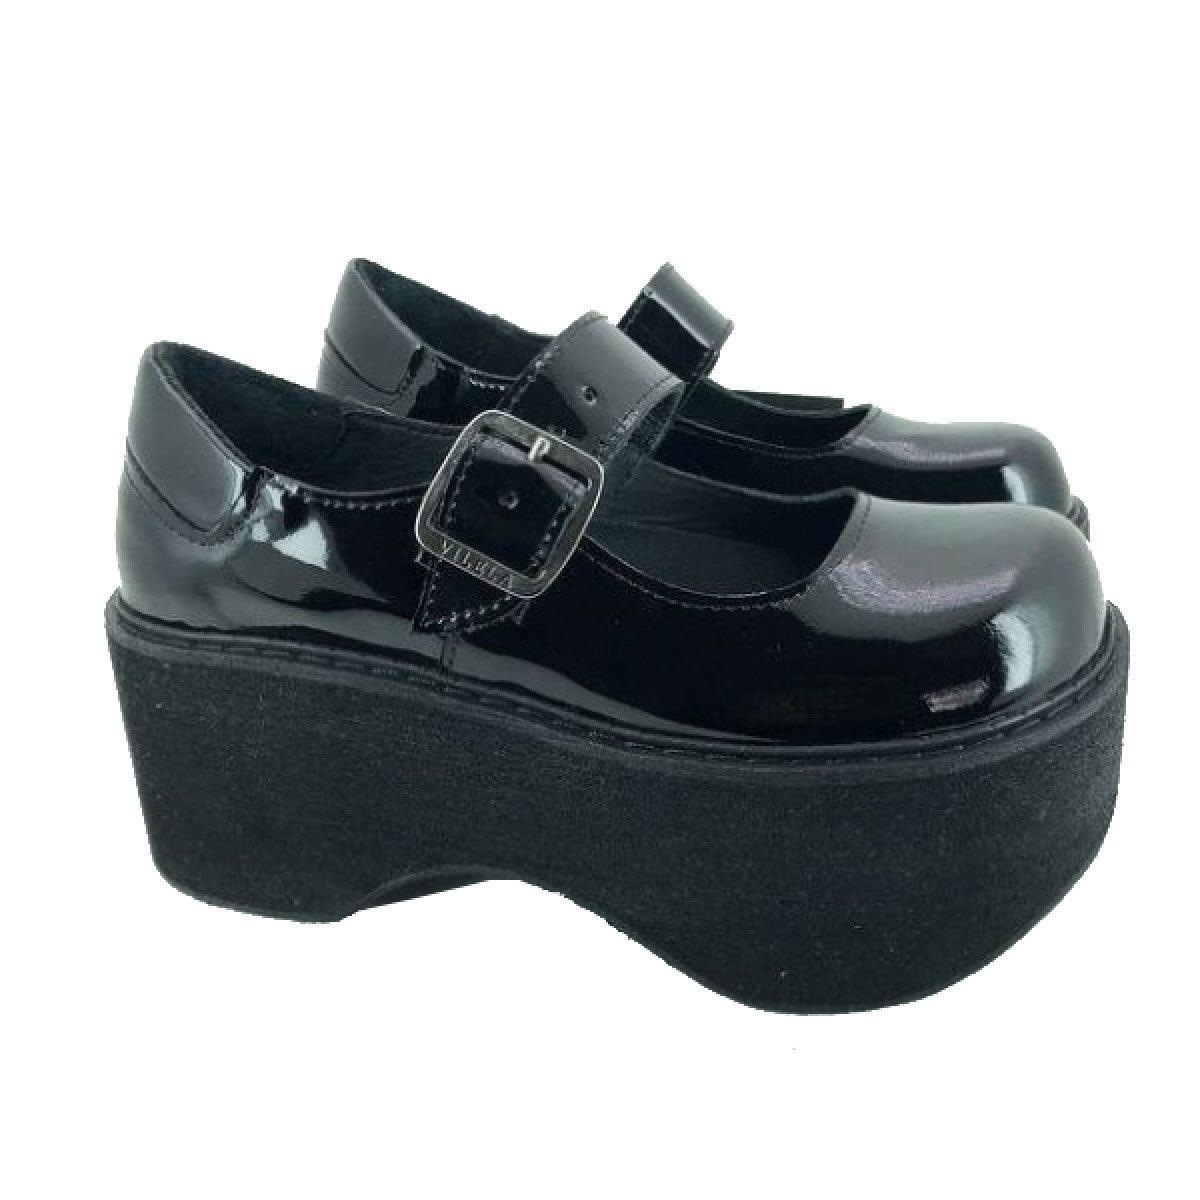 Sapato Boneca Envernizado Salto Plataforma Canoa Ref037